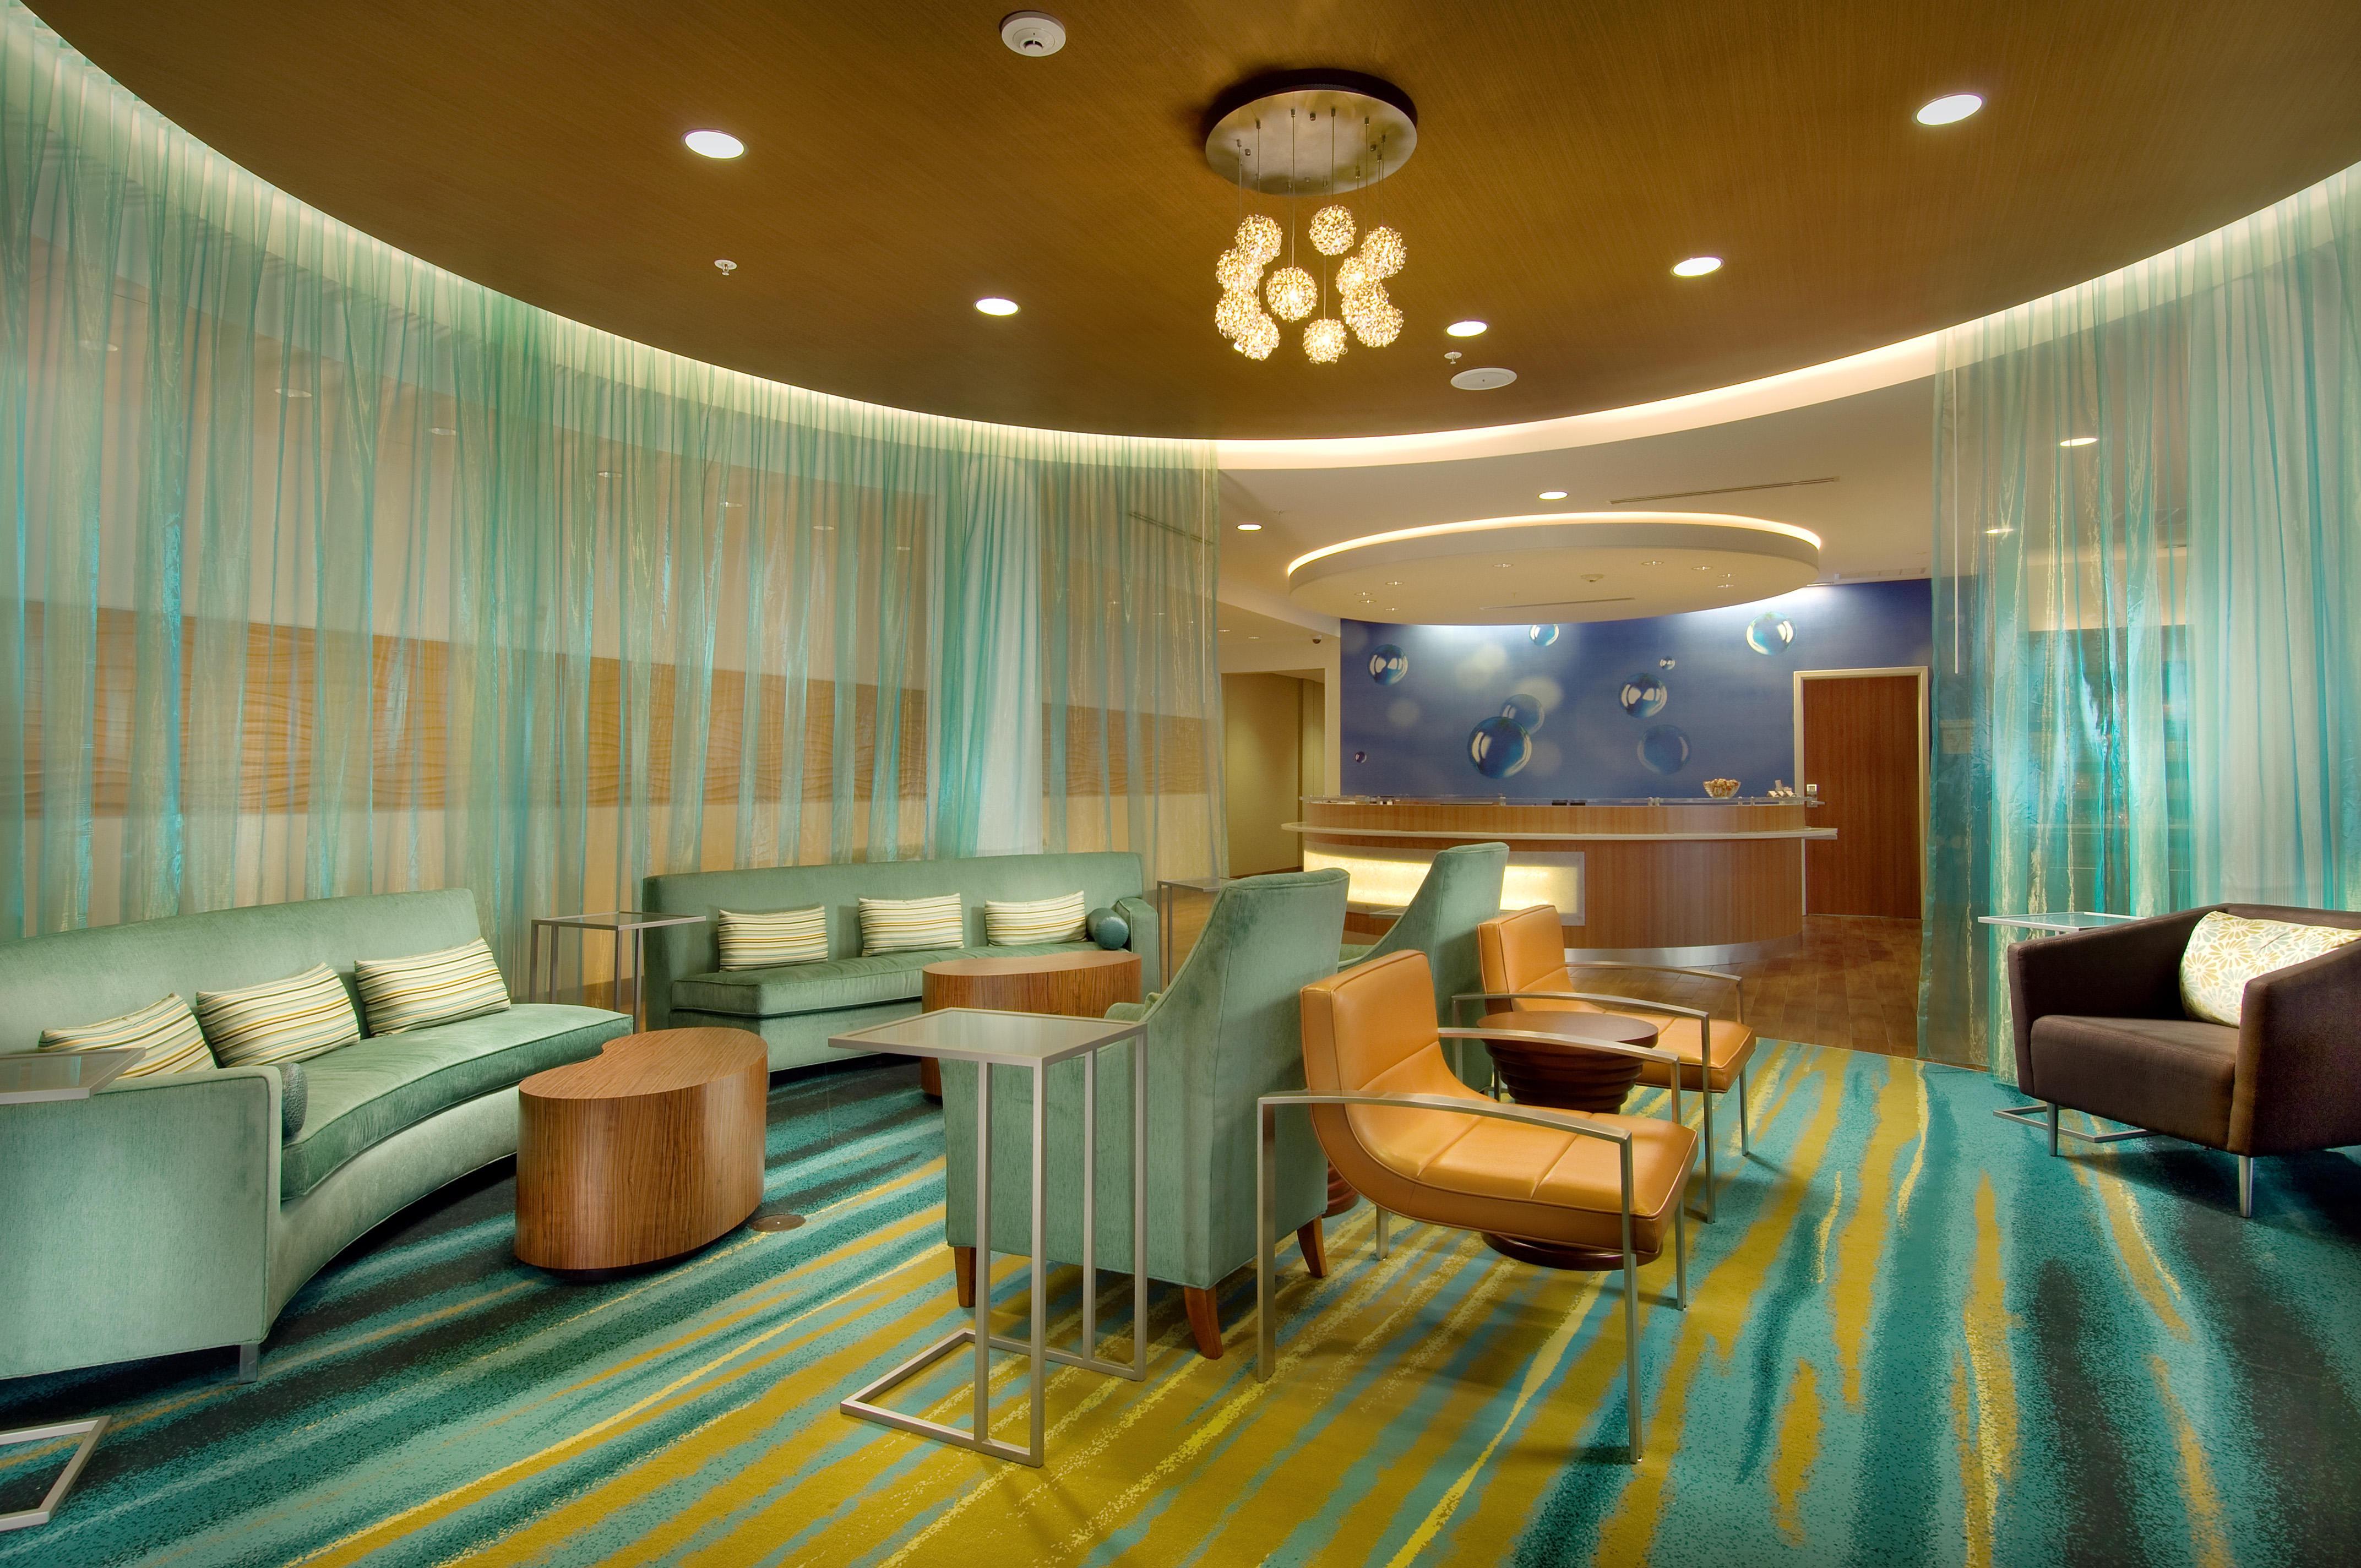 SpringHill Suites by Marriott Potomac Mills Woodbridge image 7